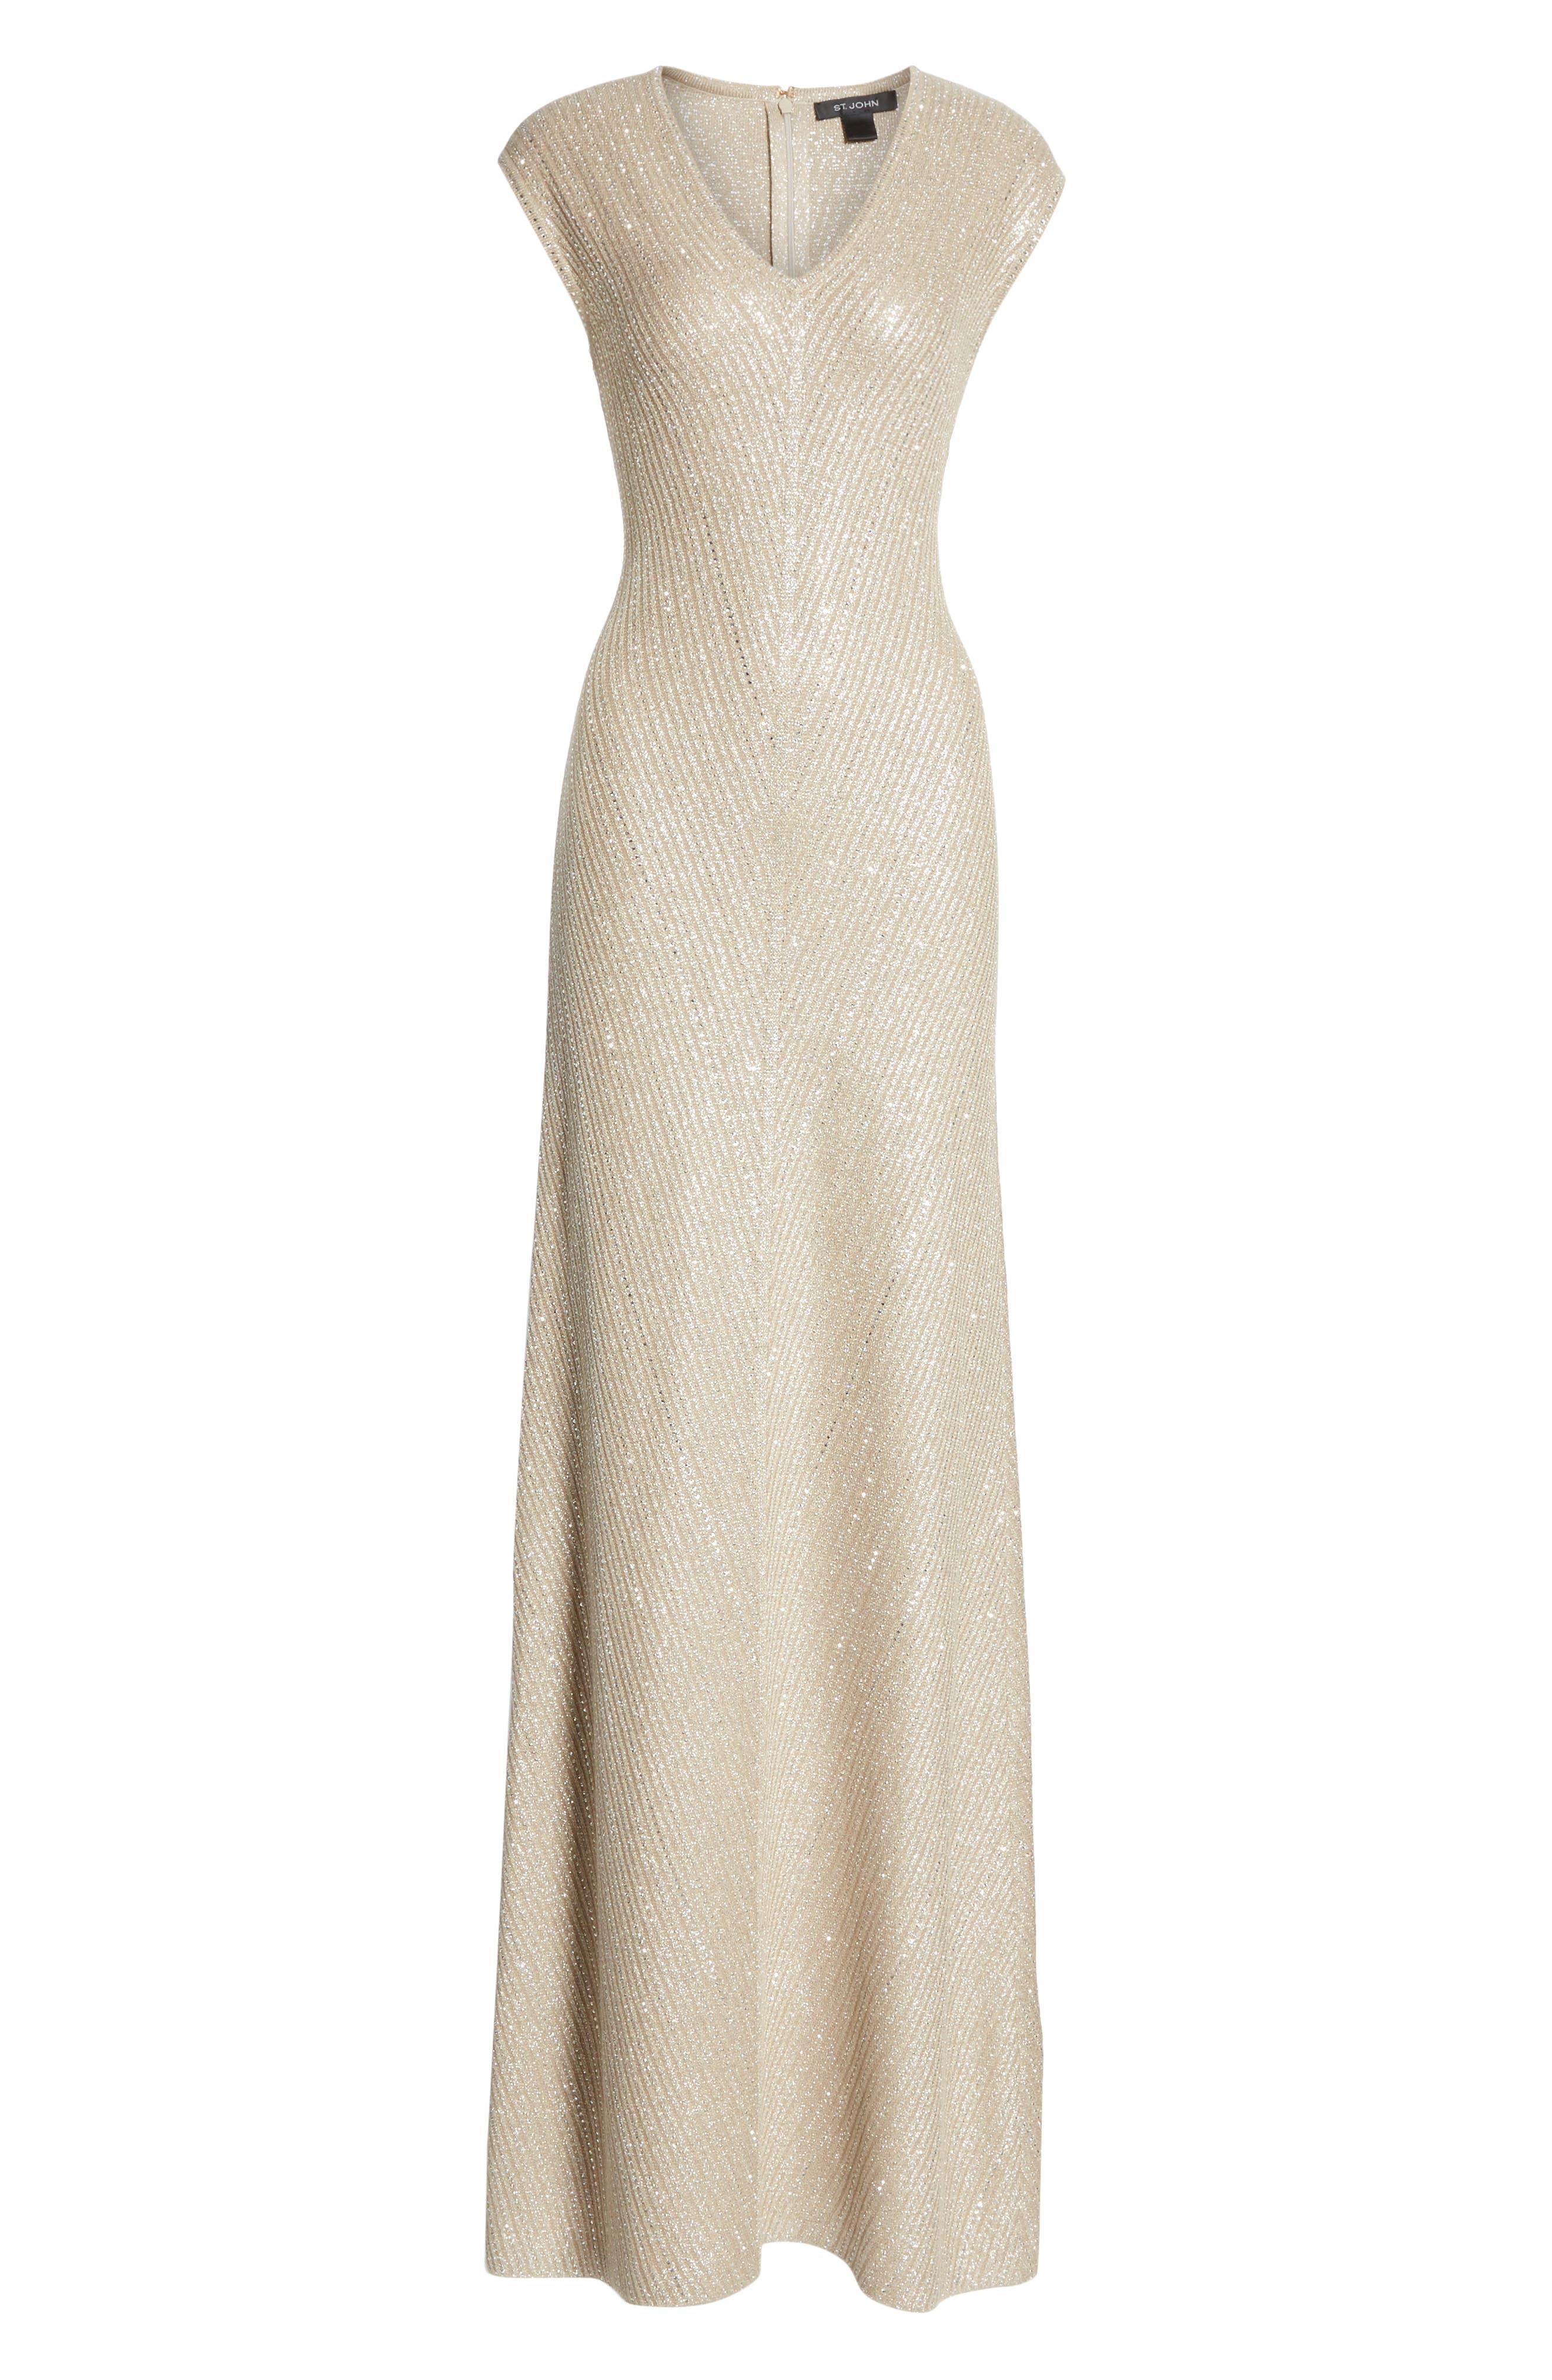 ST. JOHN COLLECTION, Brielle Knit V-Neck Gown, Alternate thumbnail 6, color, DARK KHAKI/ GOLD